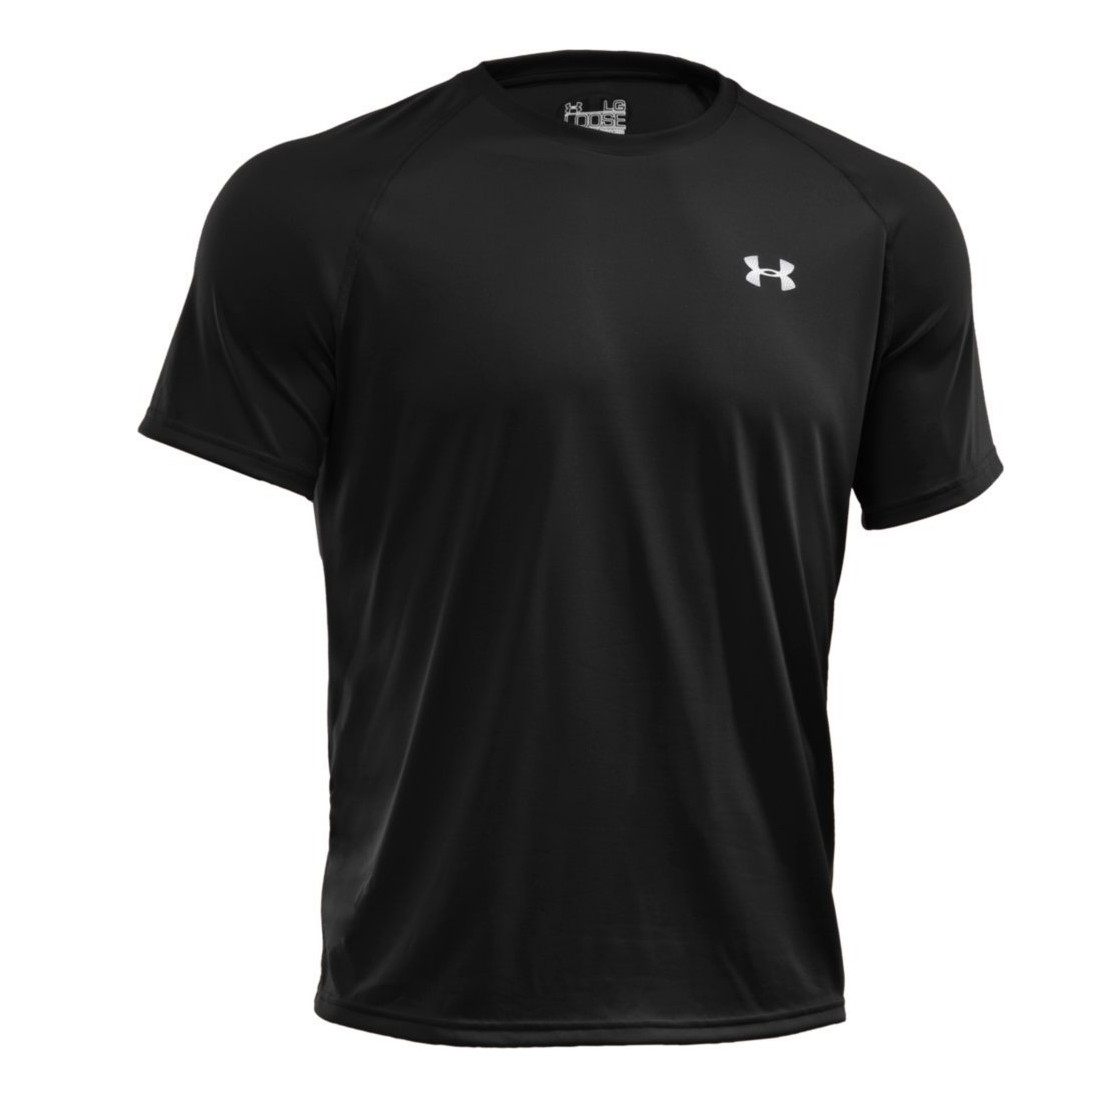 Under Armour Tech Short Sleeve Top Black O Dwyers Golf